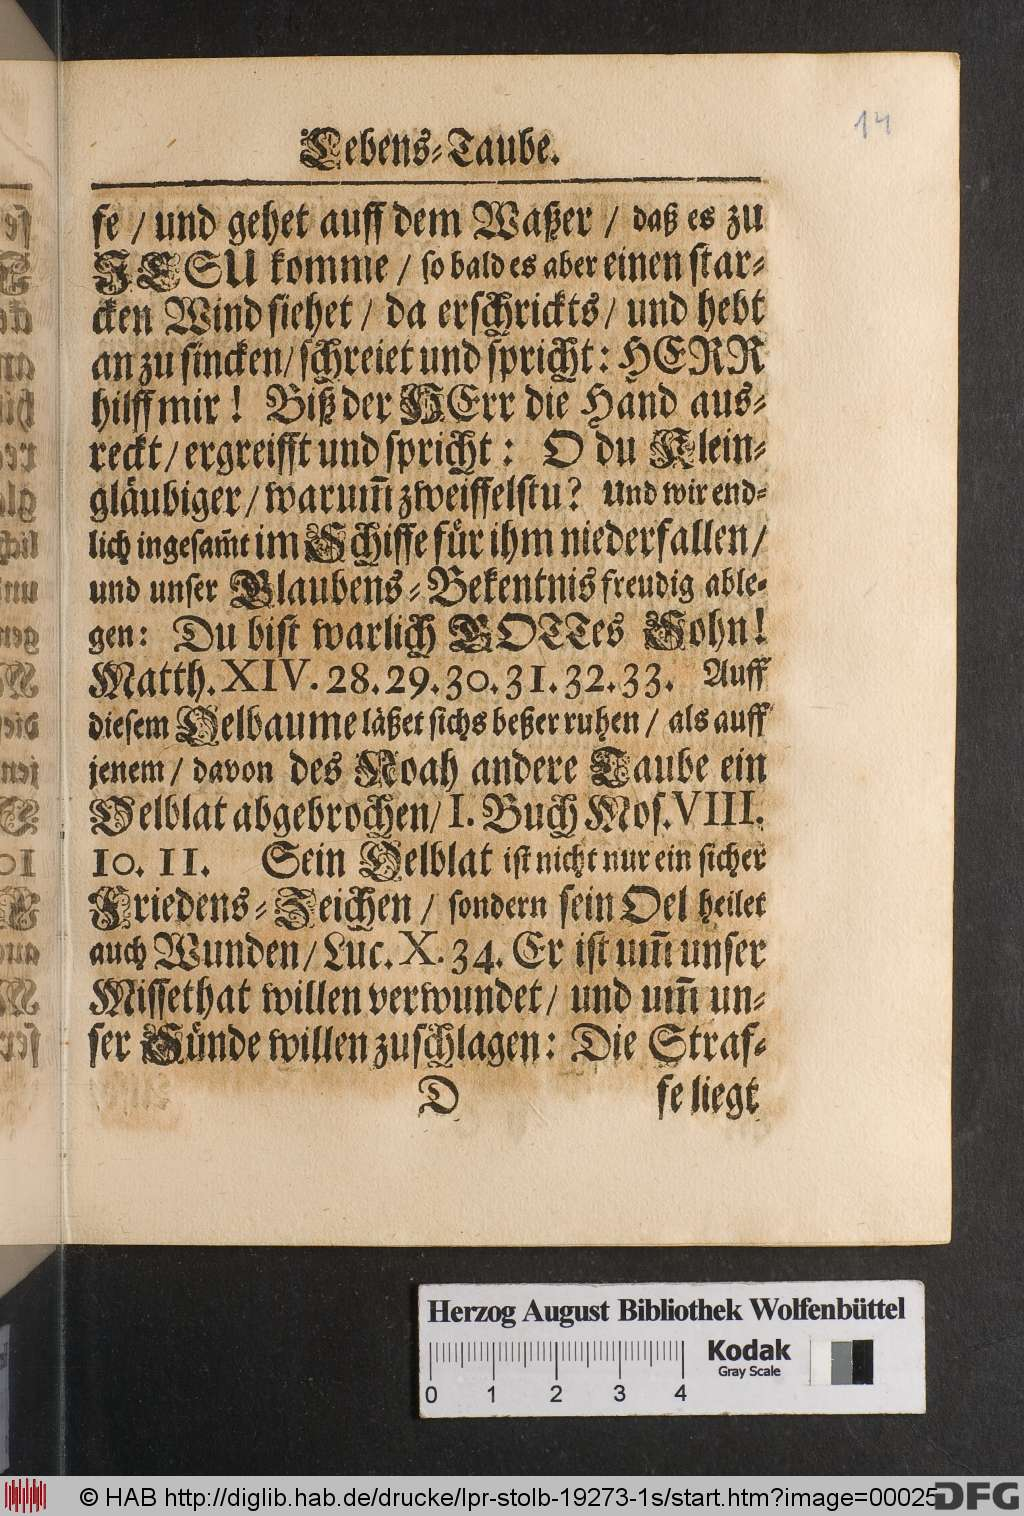 http://diglib.hab.de/drucke/lpr-stolb-19273-1s/00025.jpg